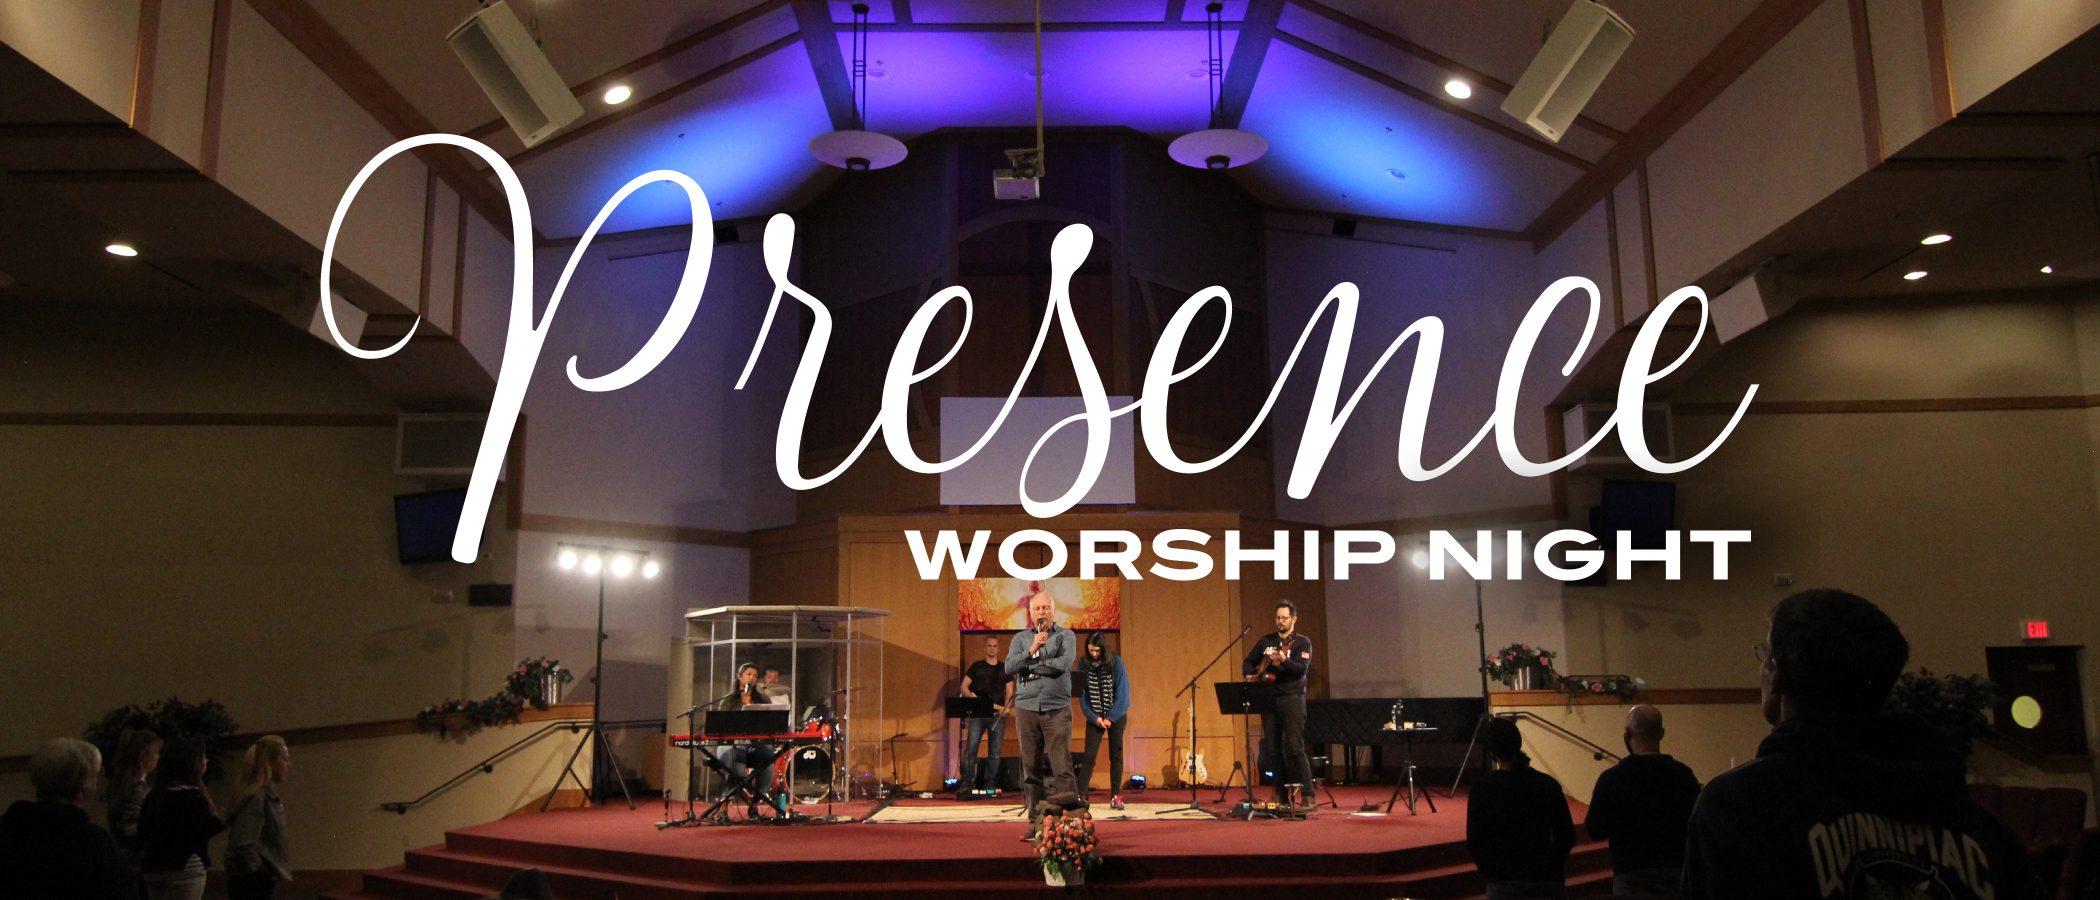 presence-worship-night-11brd-dq2021-ben-and-worship-band-web-banner22x-100